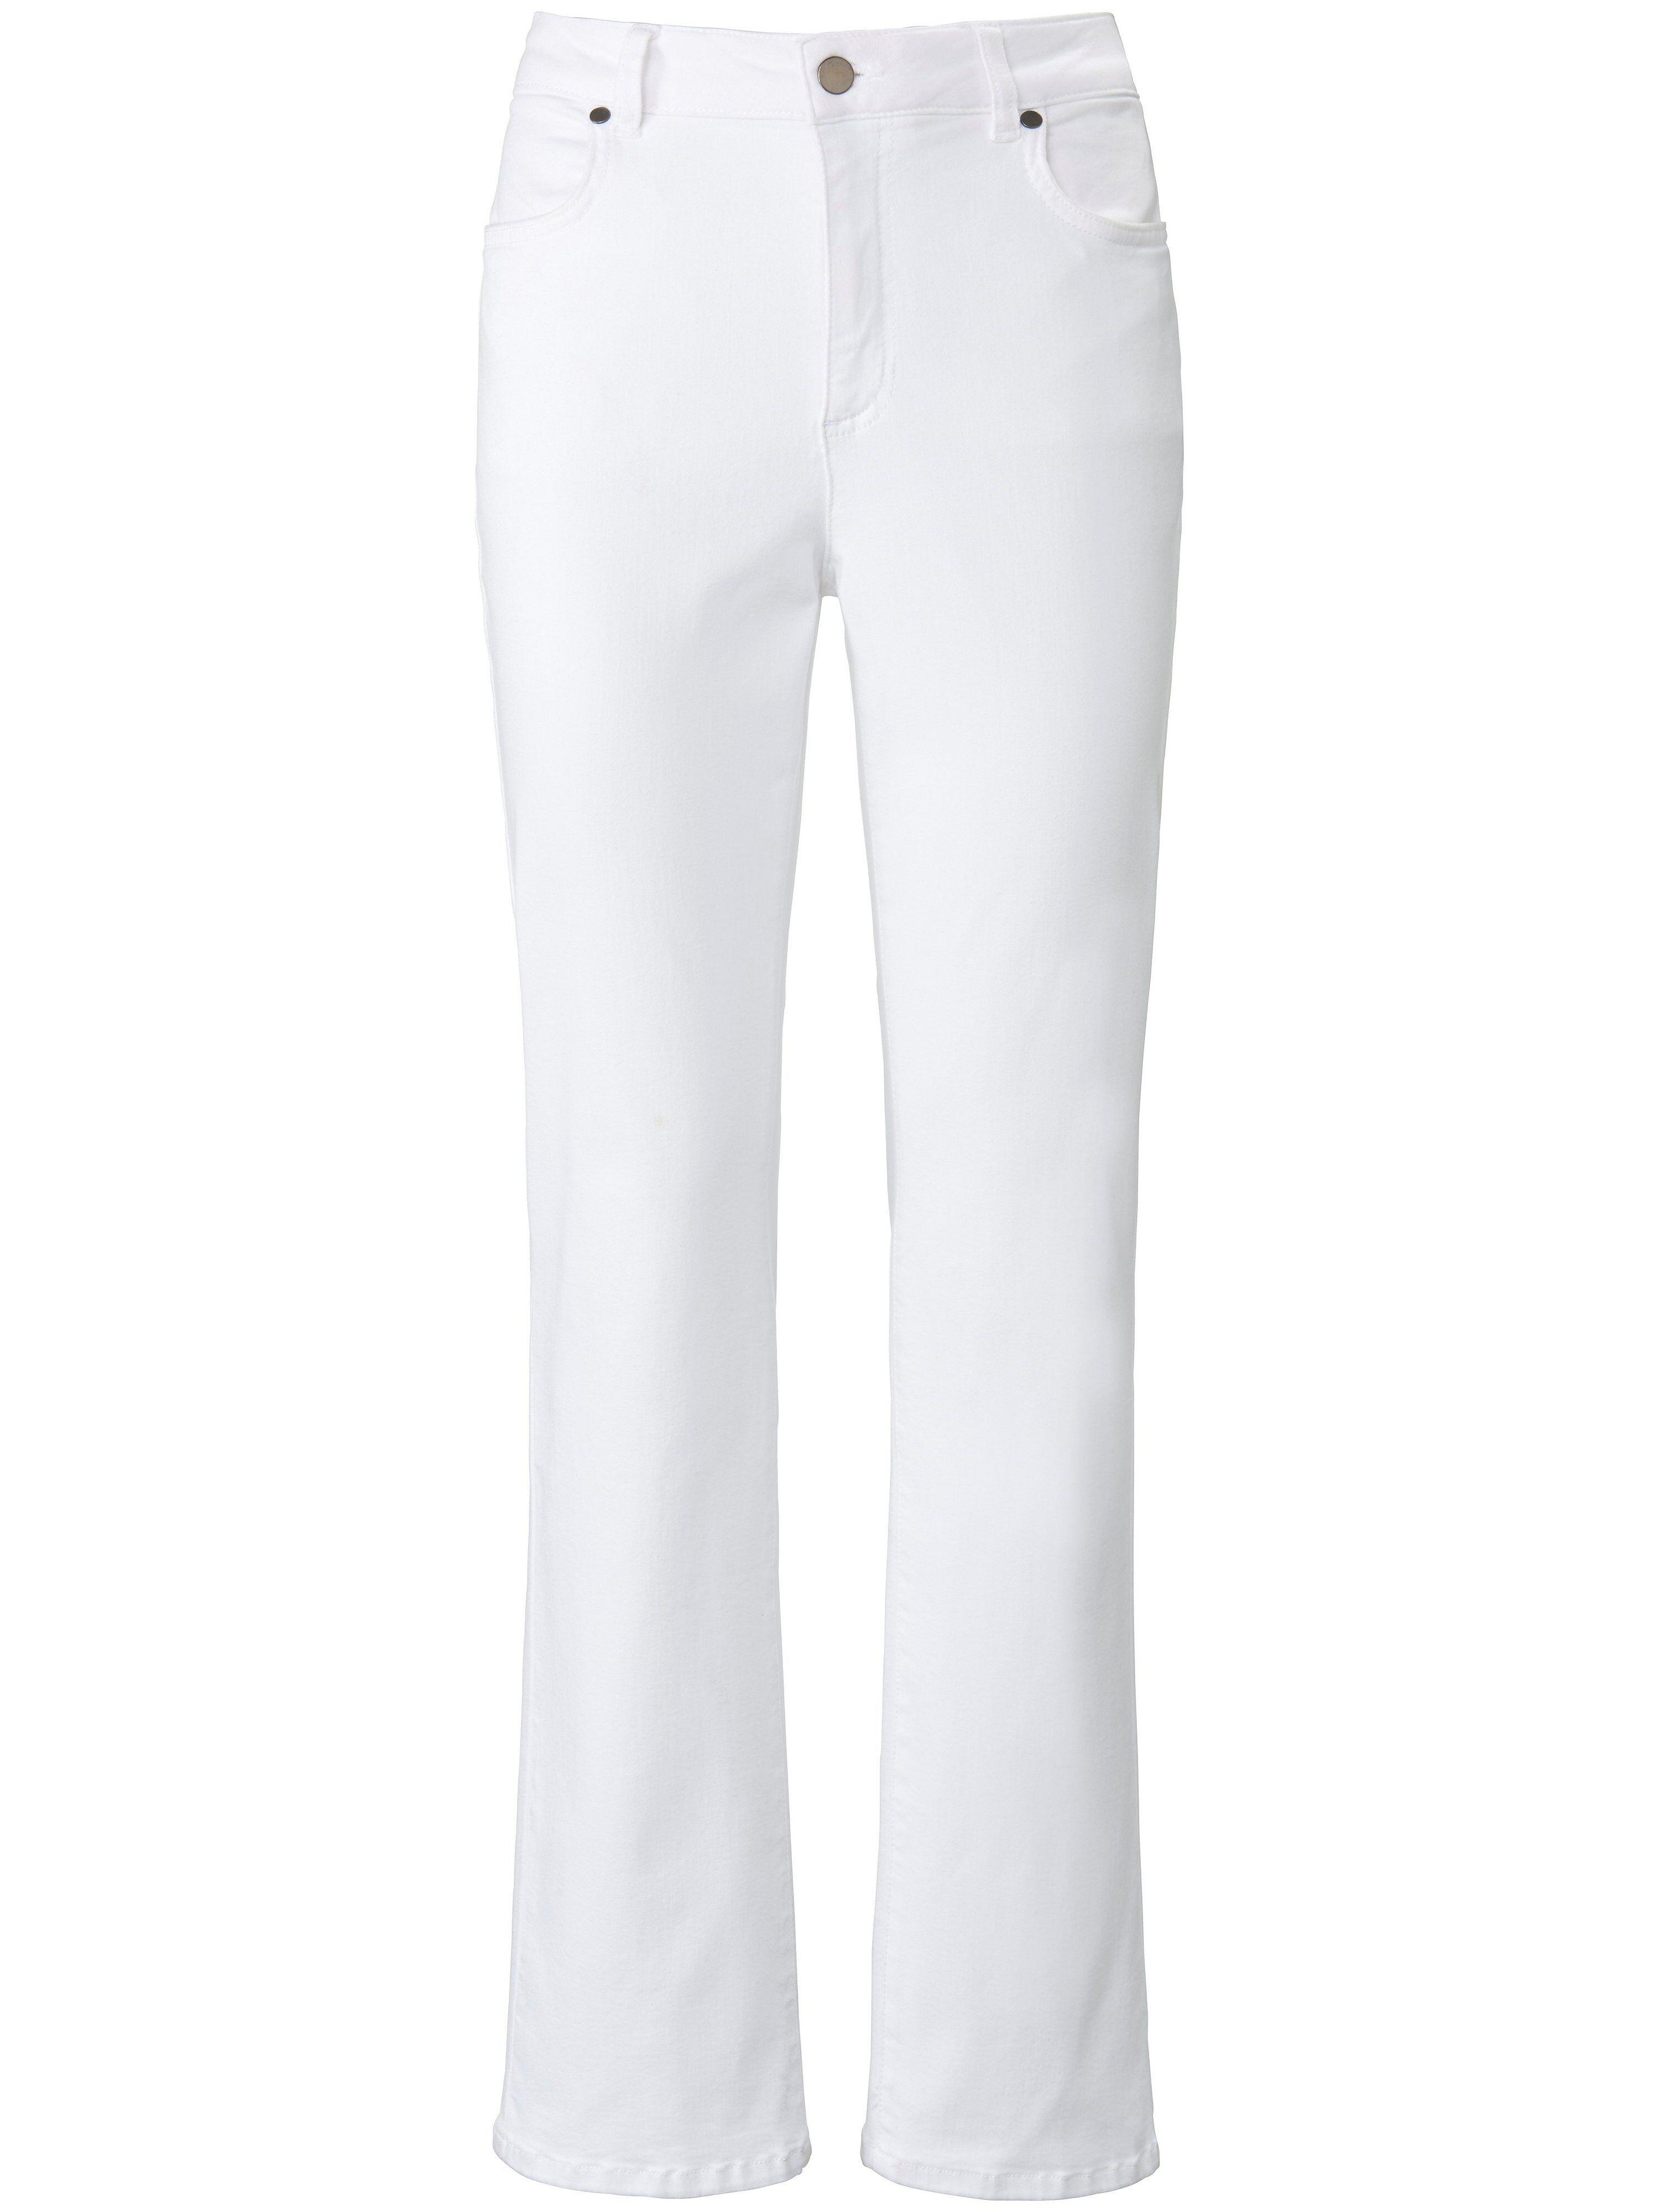 Uta Raasch Le jean ligne droite  Uta Raasch blanc  - Femme - 38